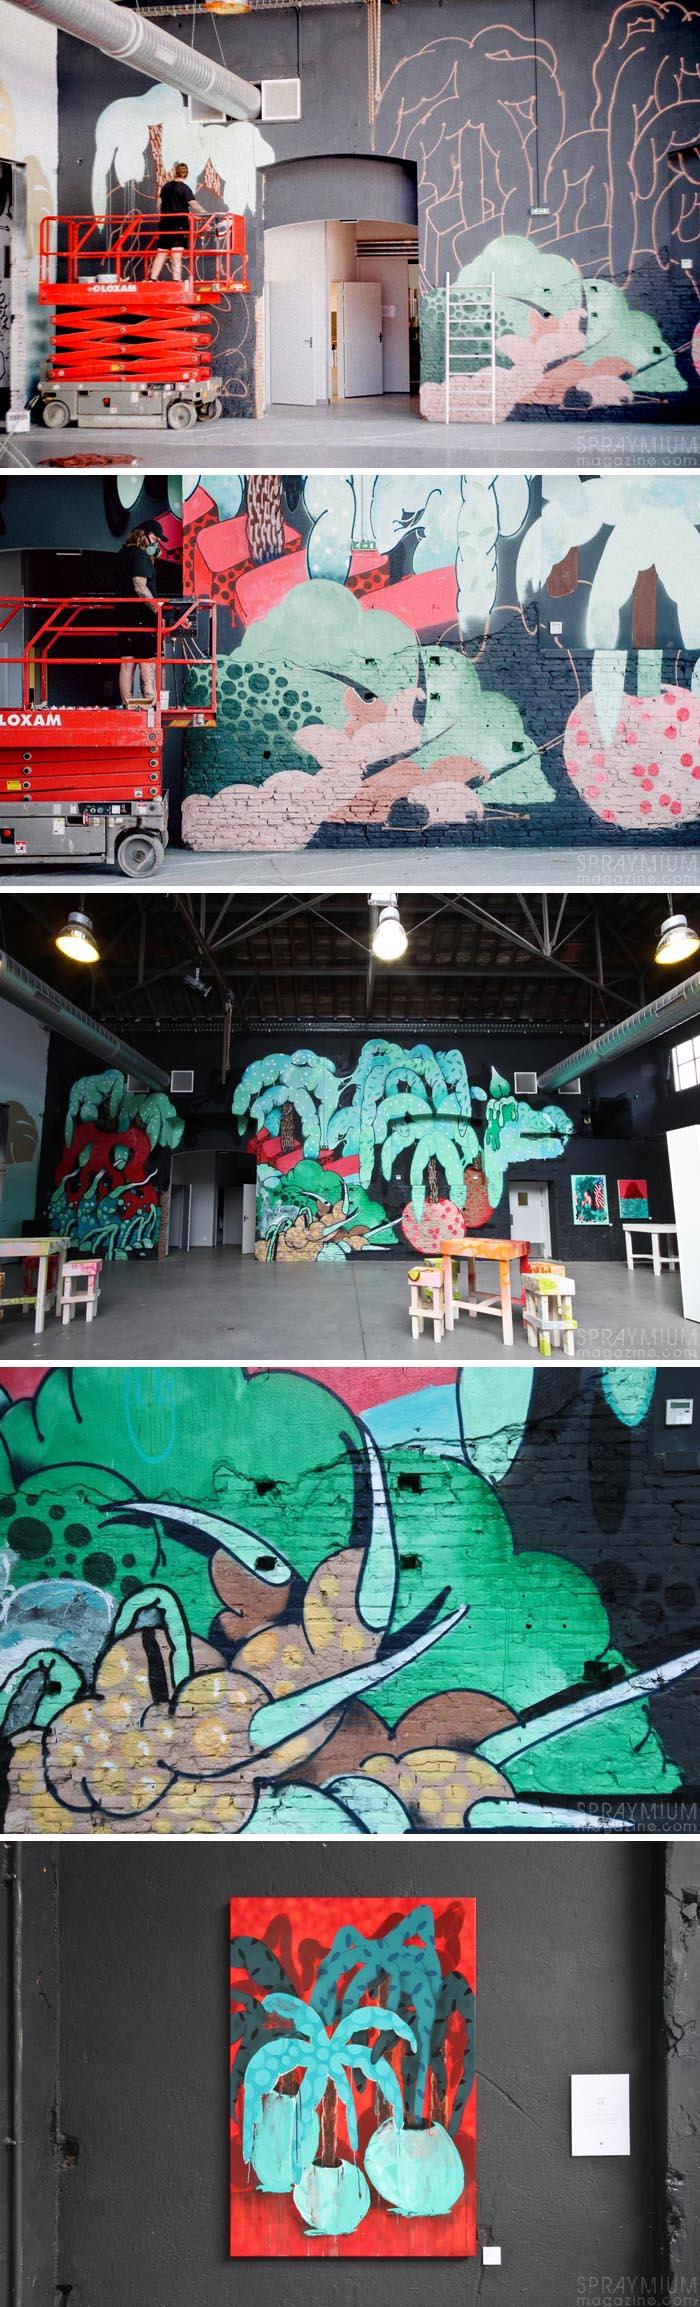 exposition mister freeze toulouse art urbain contemporain graffiti postgraffiti streetart muralism spraymium ilk